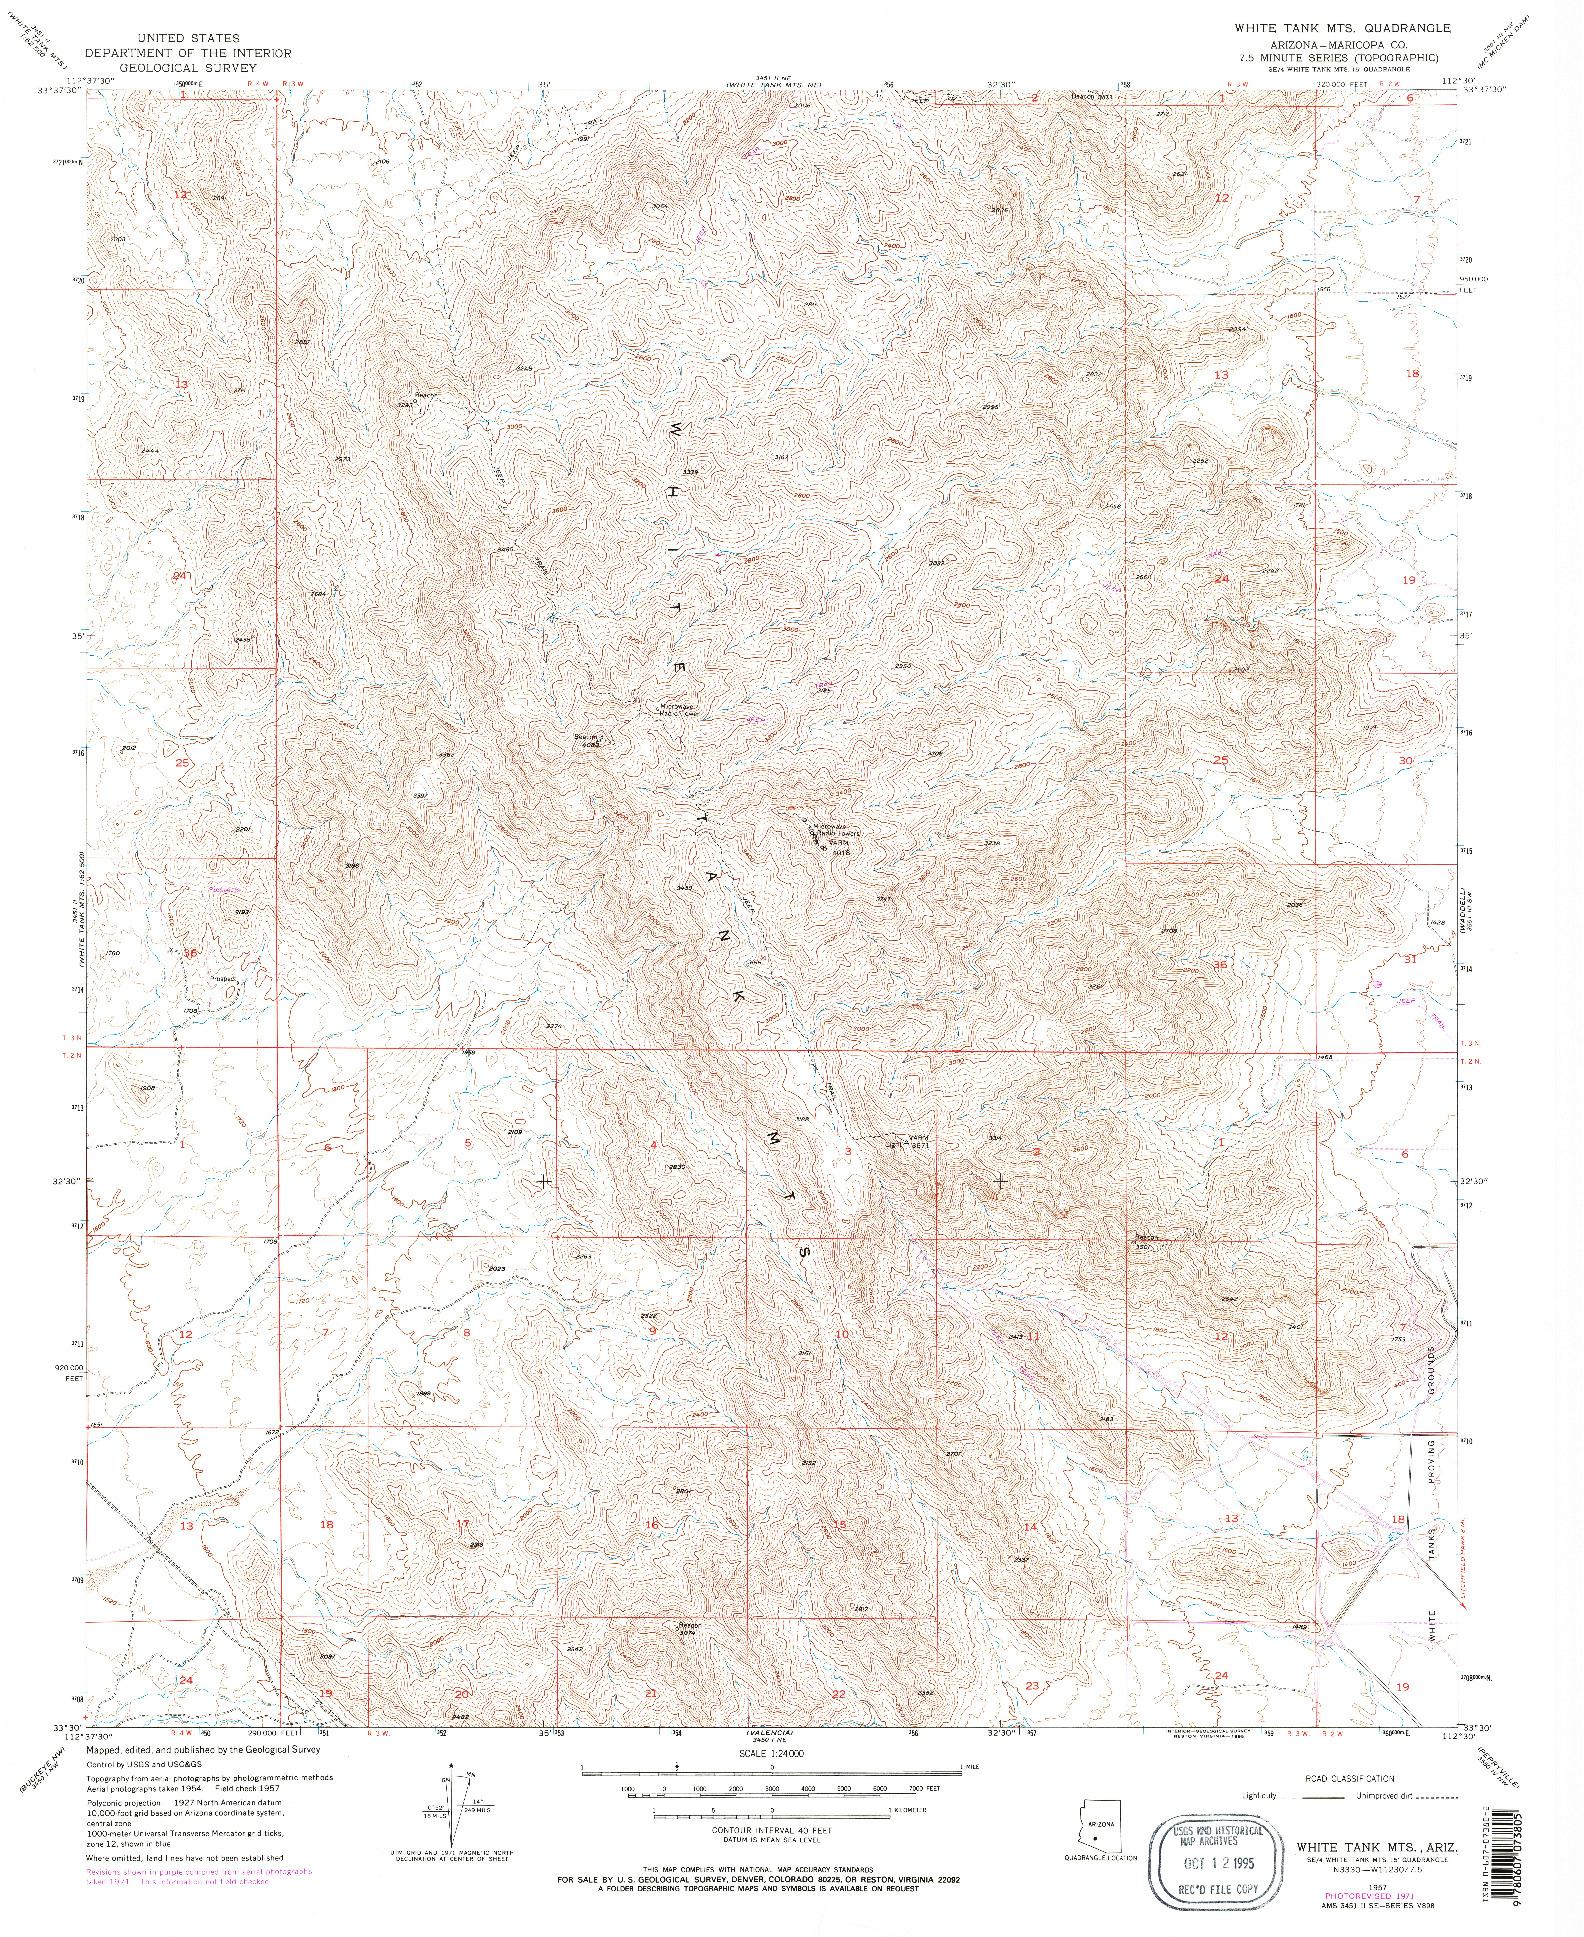 USGS 1:24000-SCALE QUADRANGLE FOR WHITE TANK MTS, AZ 1957